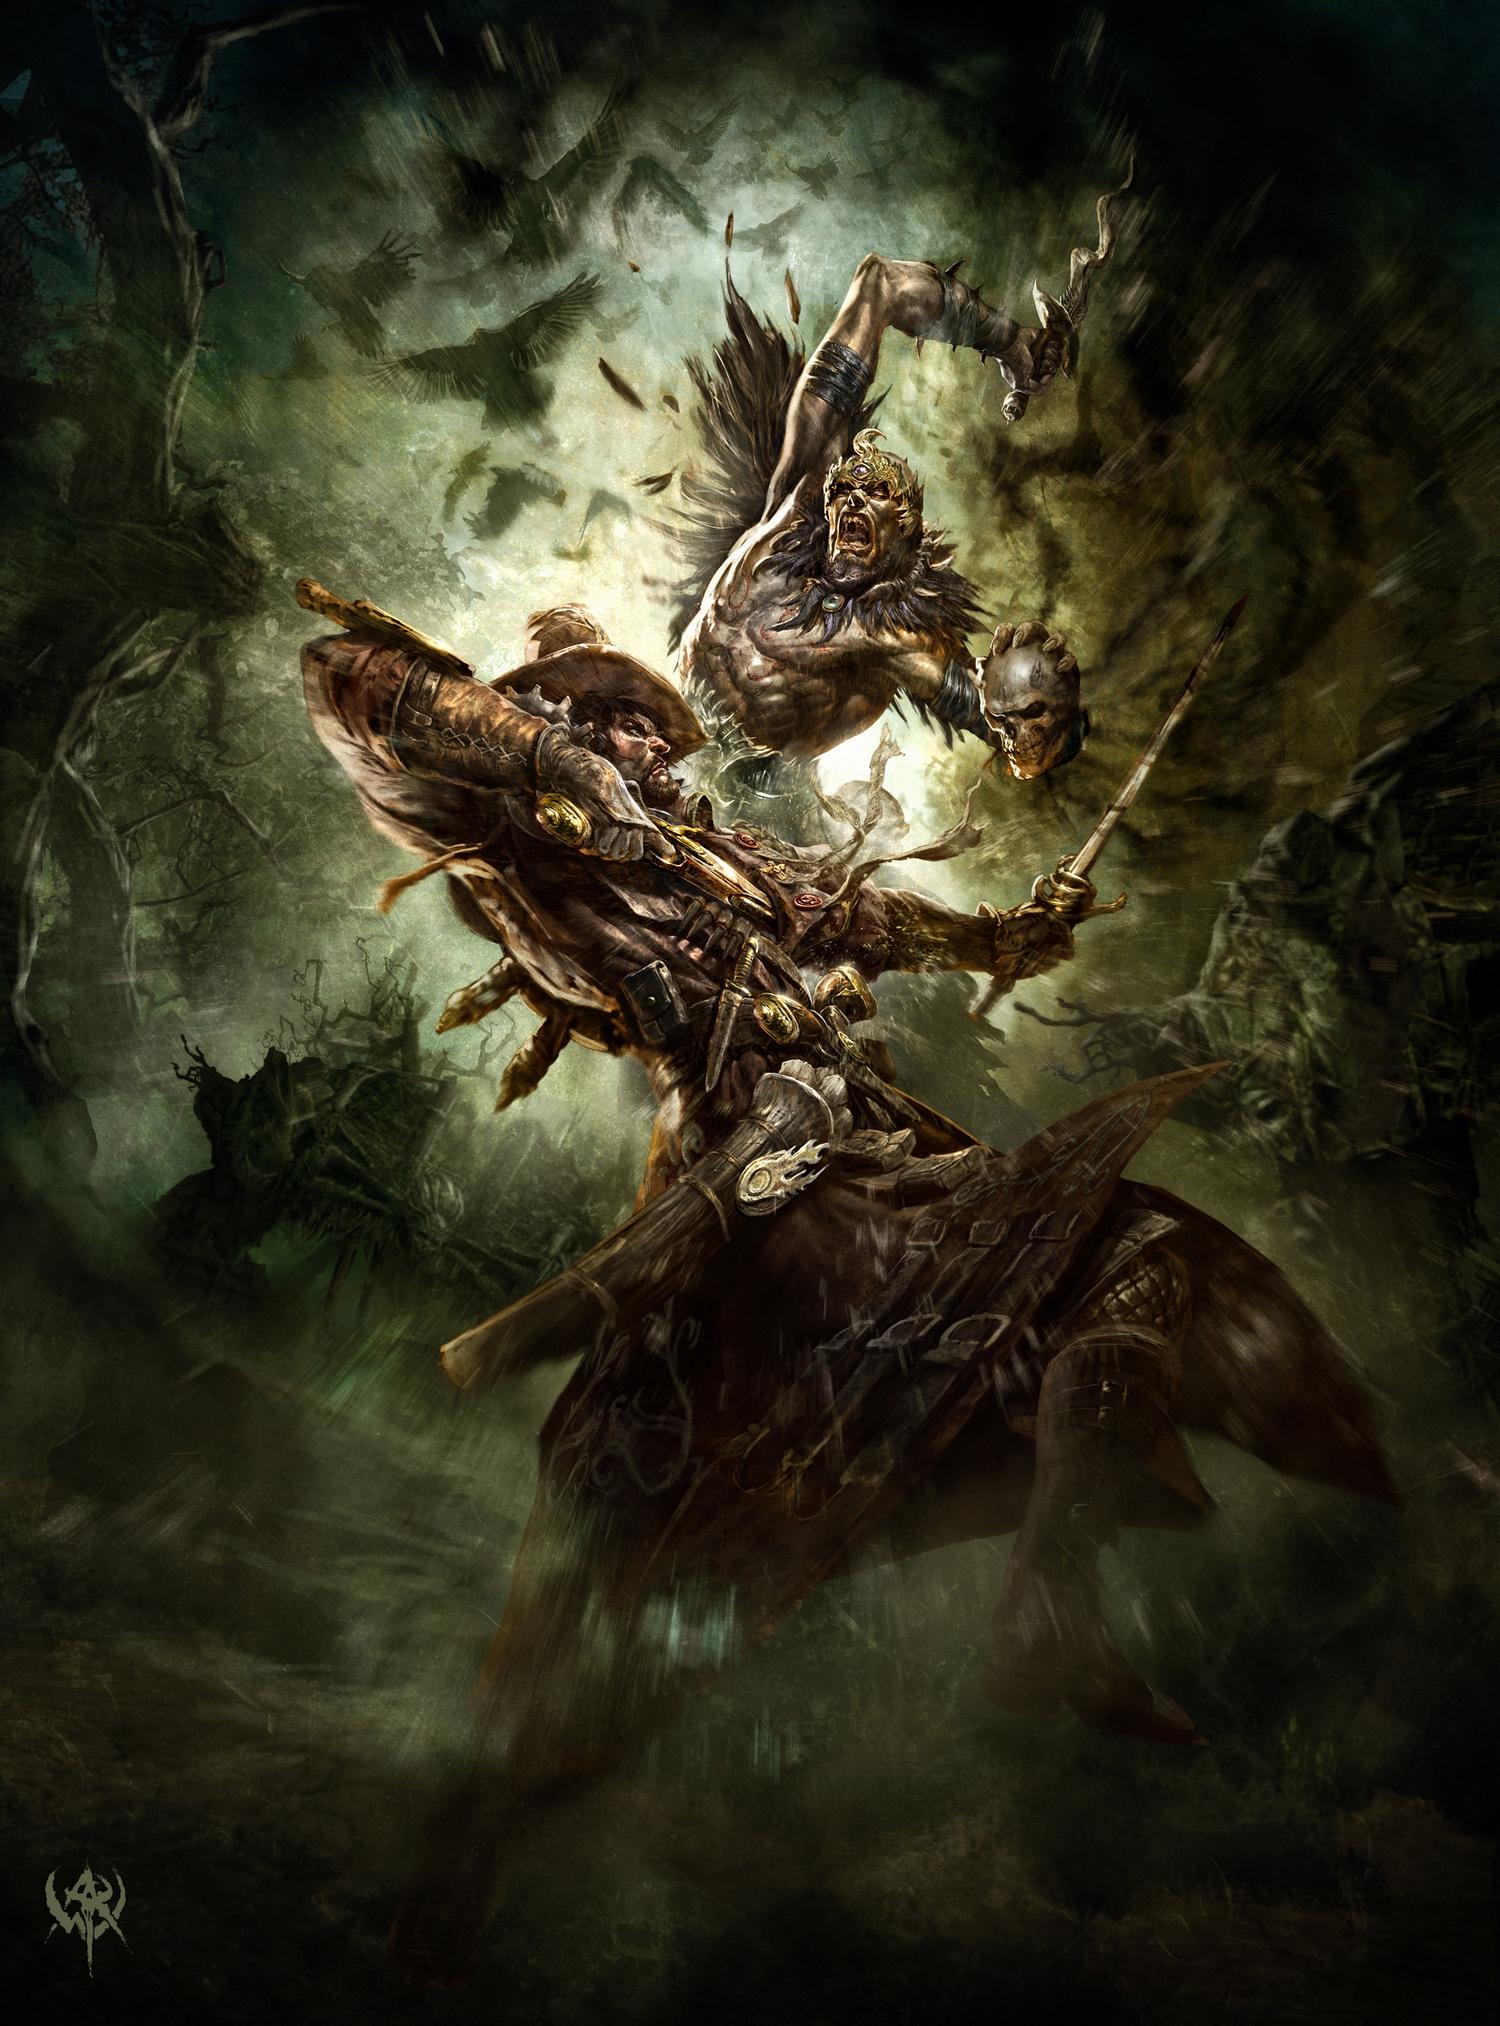 Арт к игре Warhammer Online: Age of Reckoning